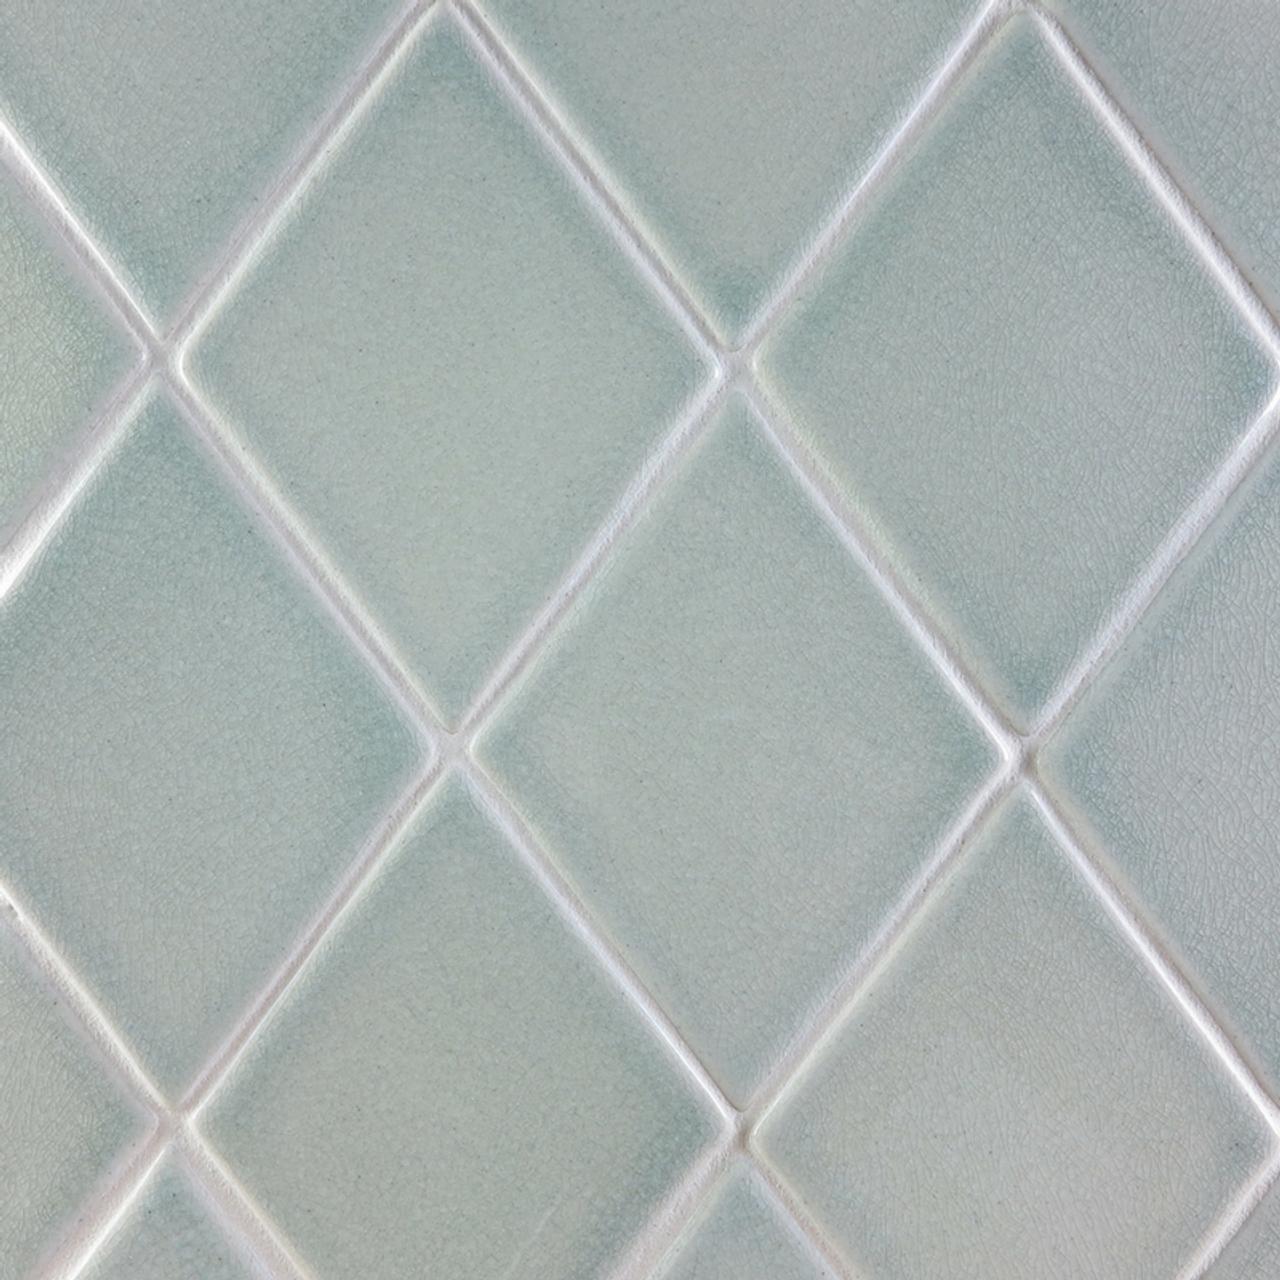 Diamond Handmade Tile Julep Tile Company - Diamond shaped tile flooring